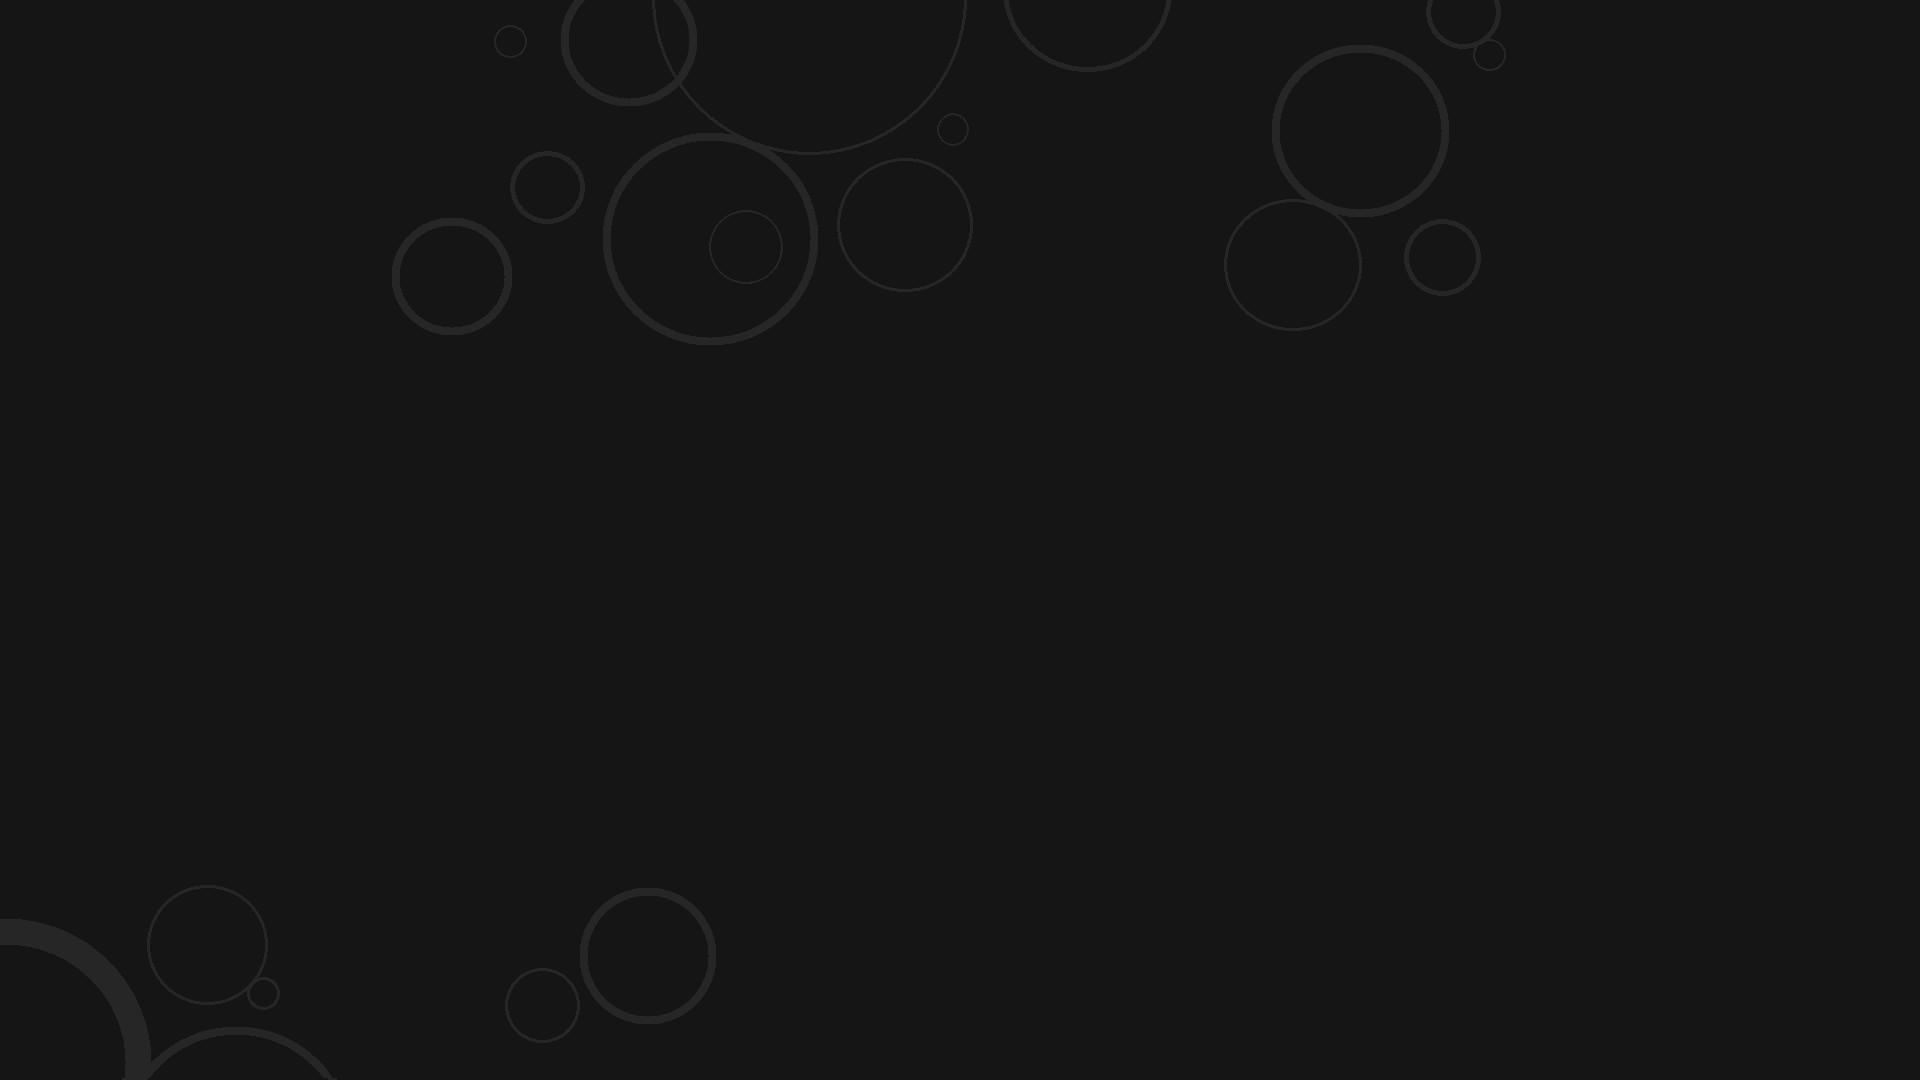 Windows 7 Black Background Posted By John Walker